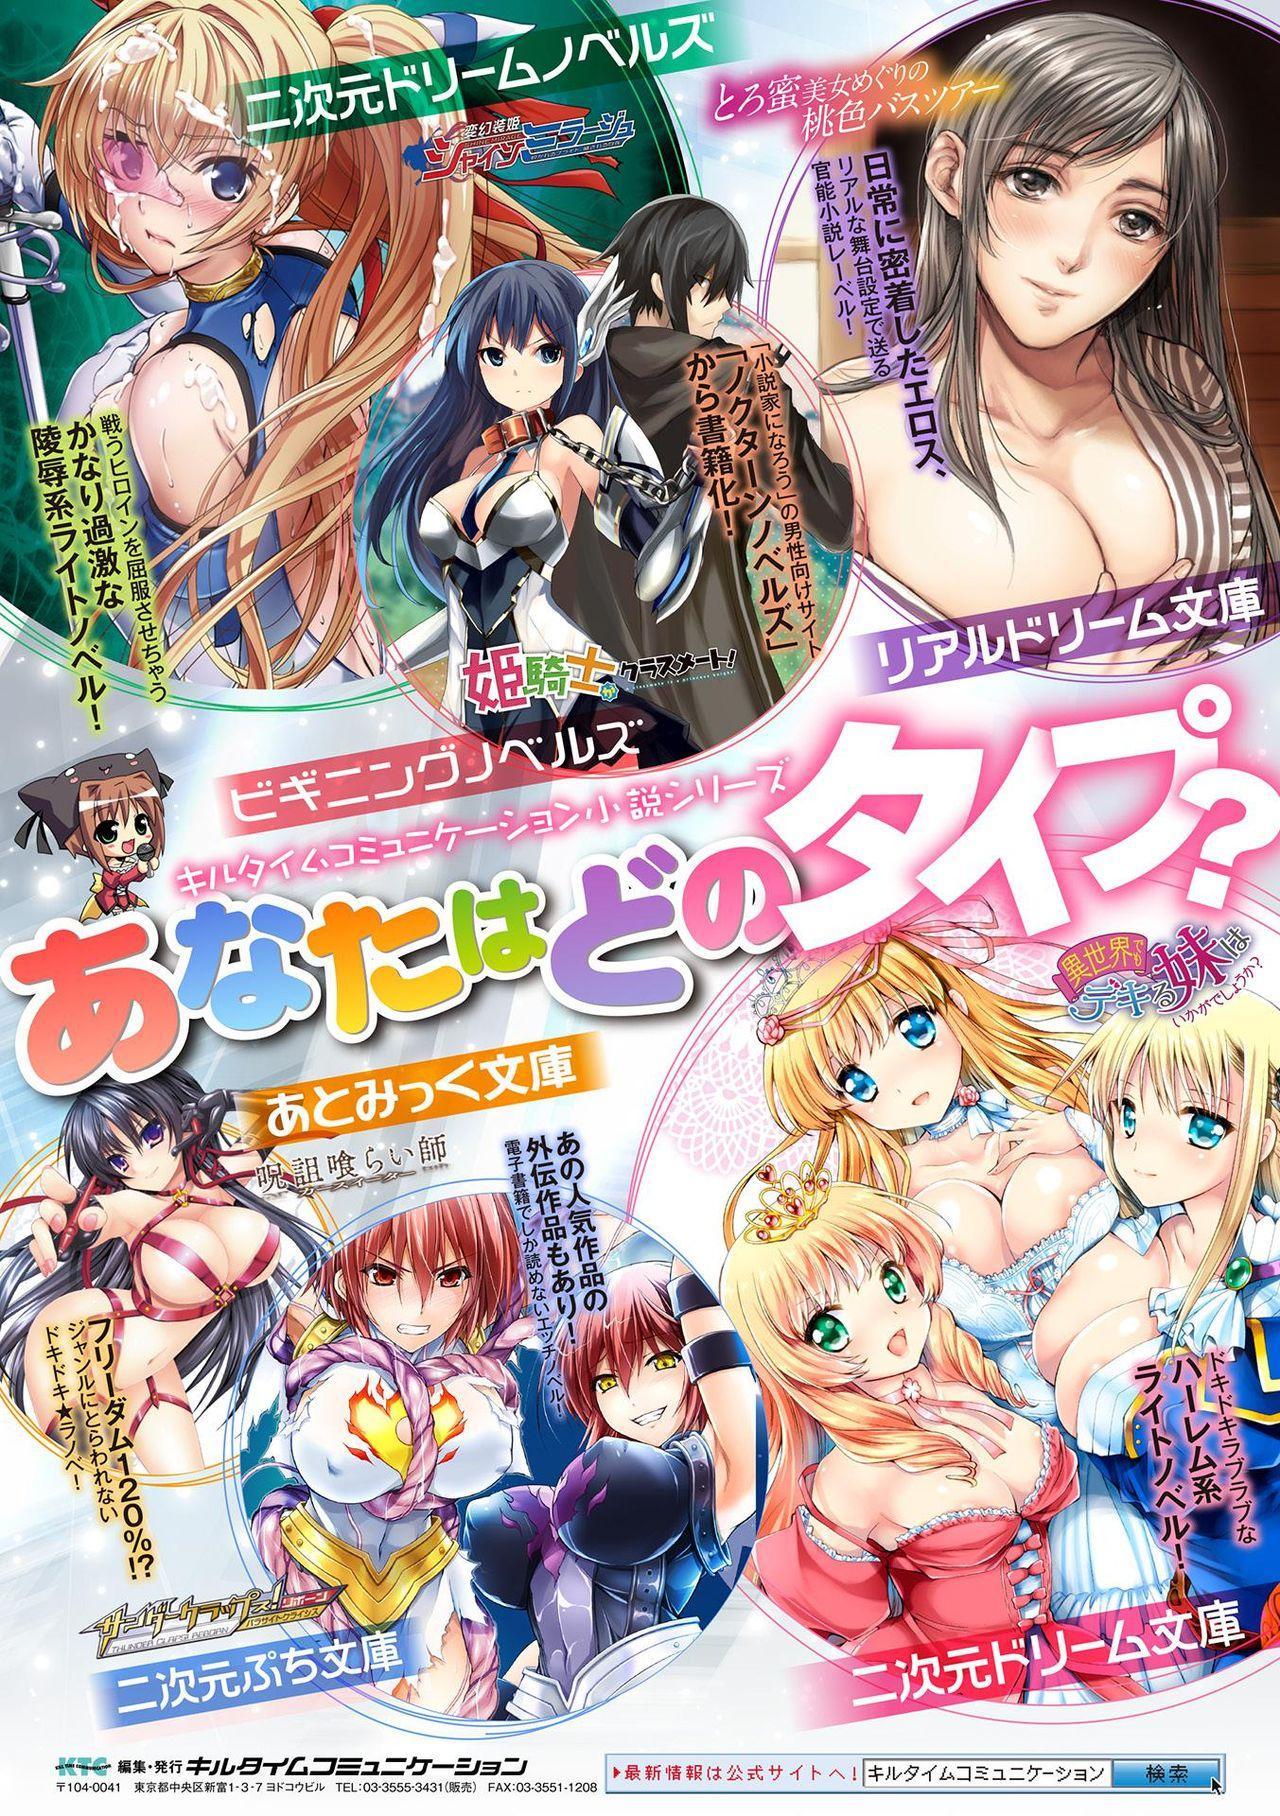 2D Comic Magazine Zecchou Kairaku ga Tomaranai Ero-Trap Dungeon Vol. 1 92